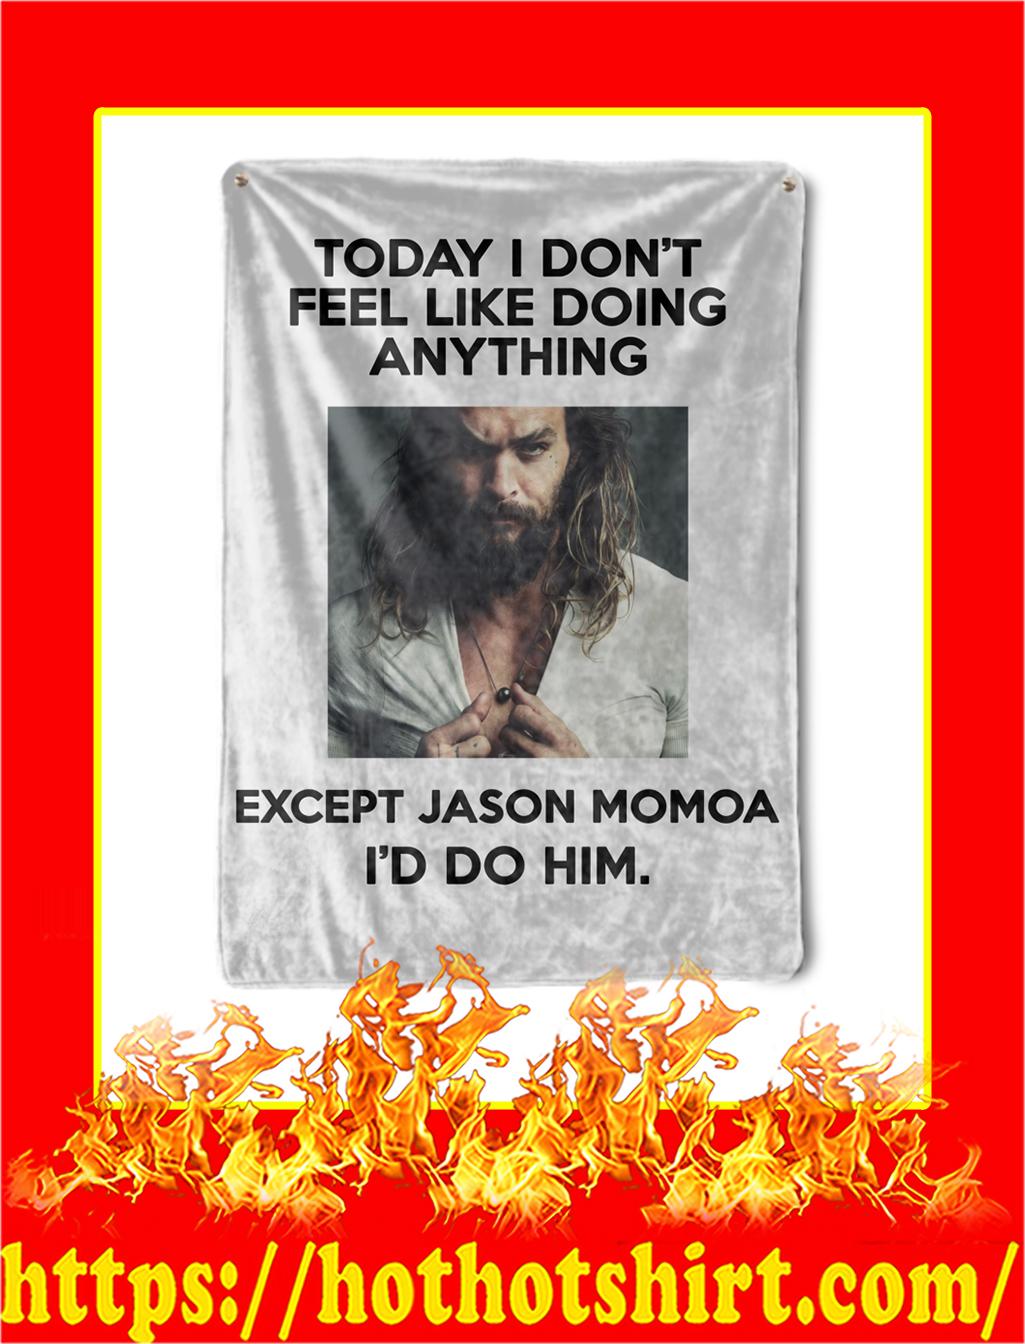 Jason Momoa Today I Don't Feel Like Doing Anything Blanket- 30x40